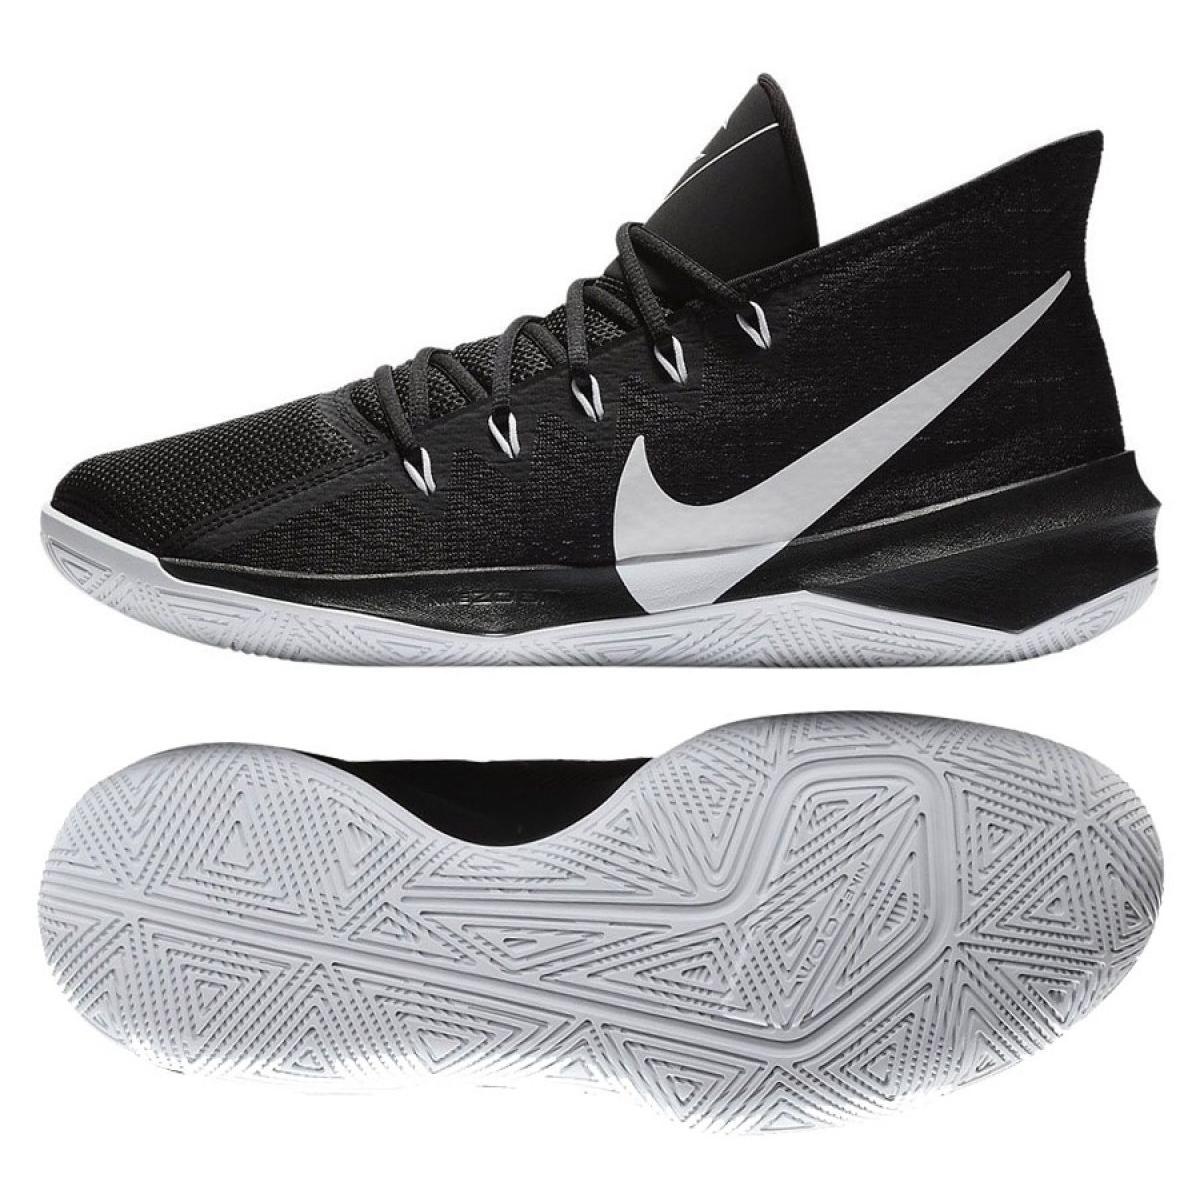 De Nike Zoom Iii M Chaussures Evidence 002 Basket Aj5904 H9YWE2DI